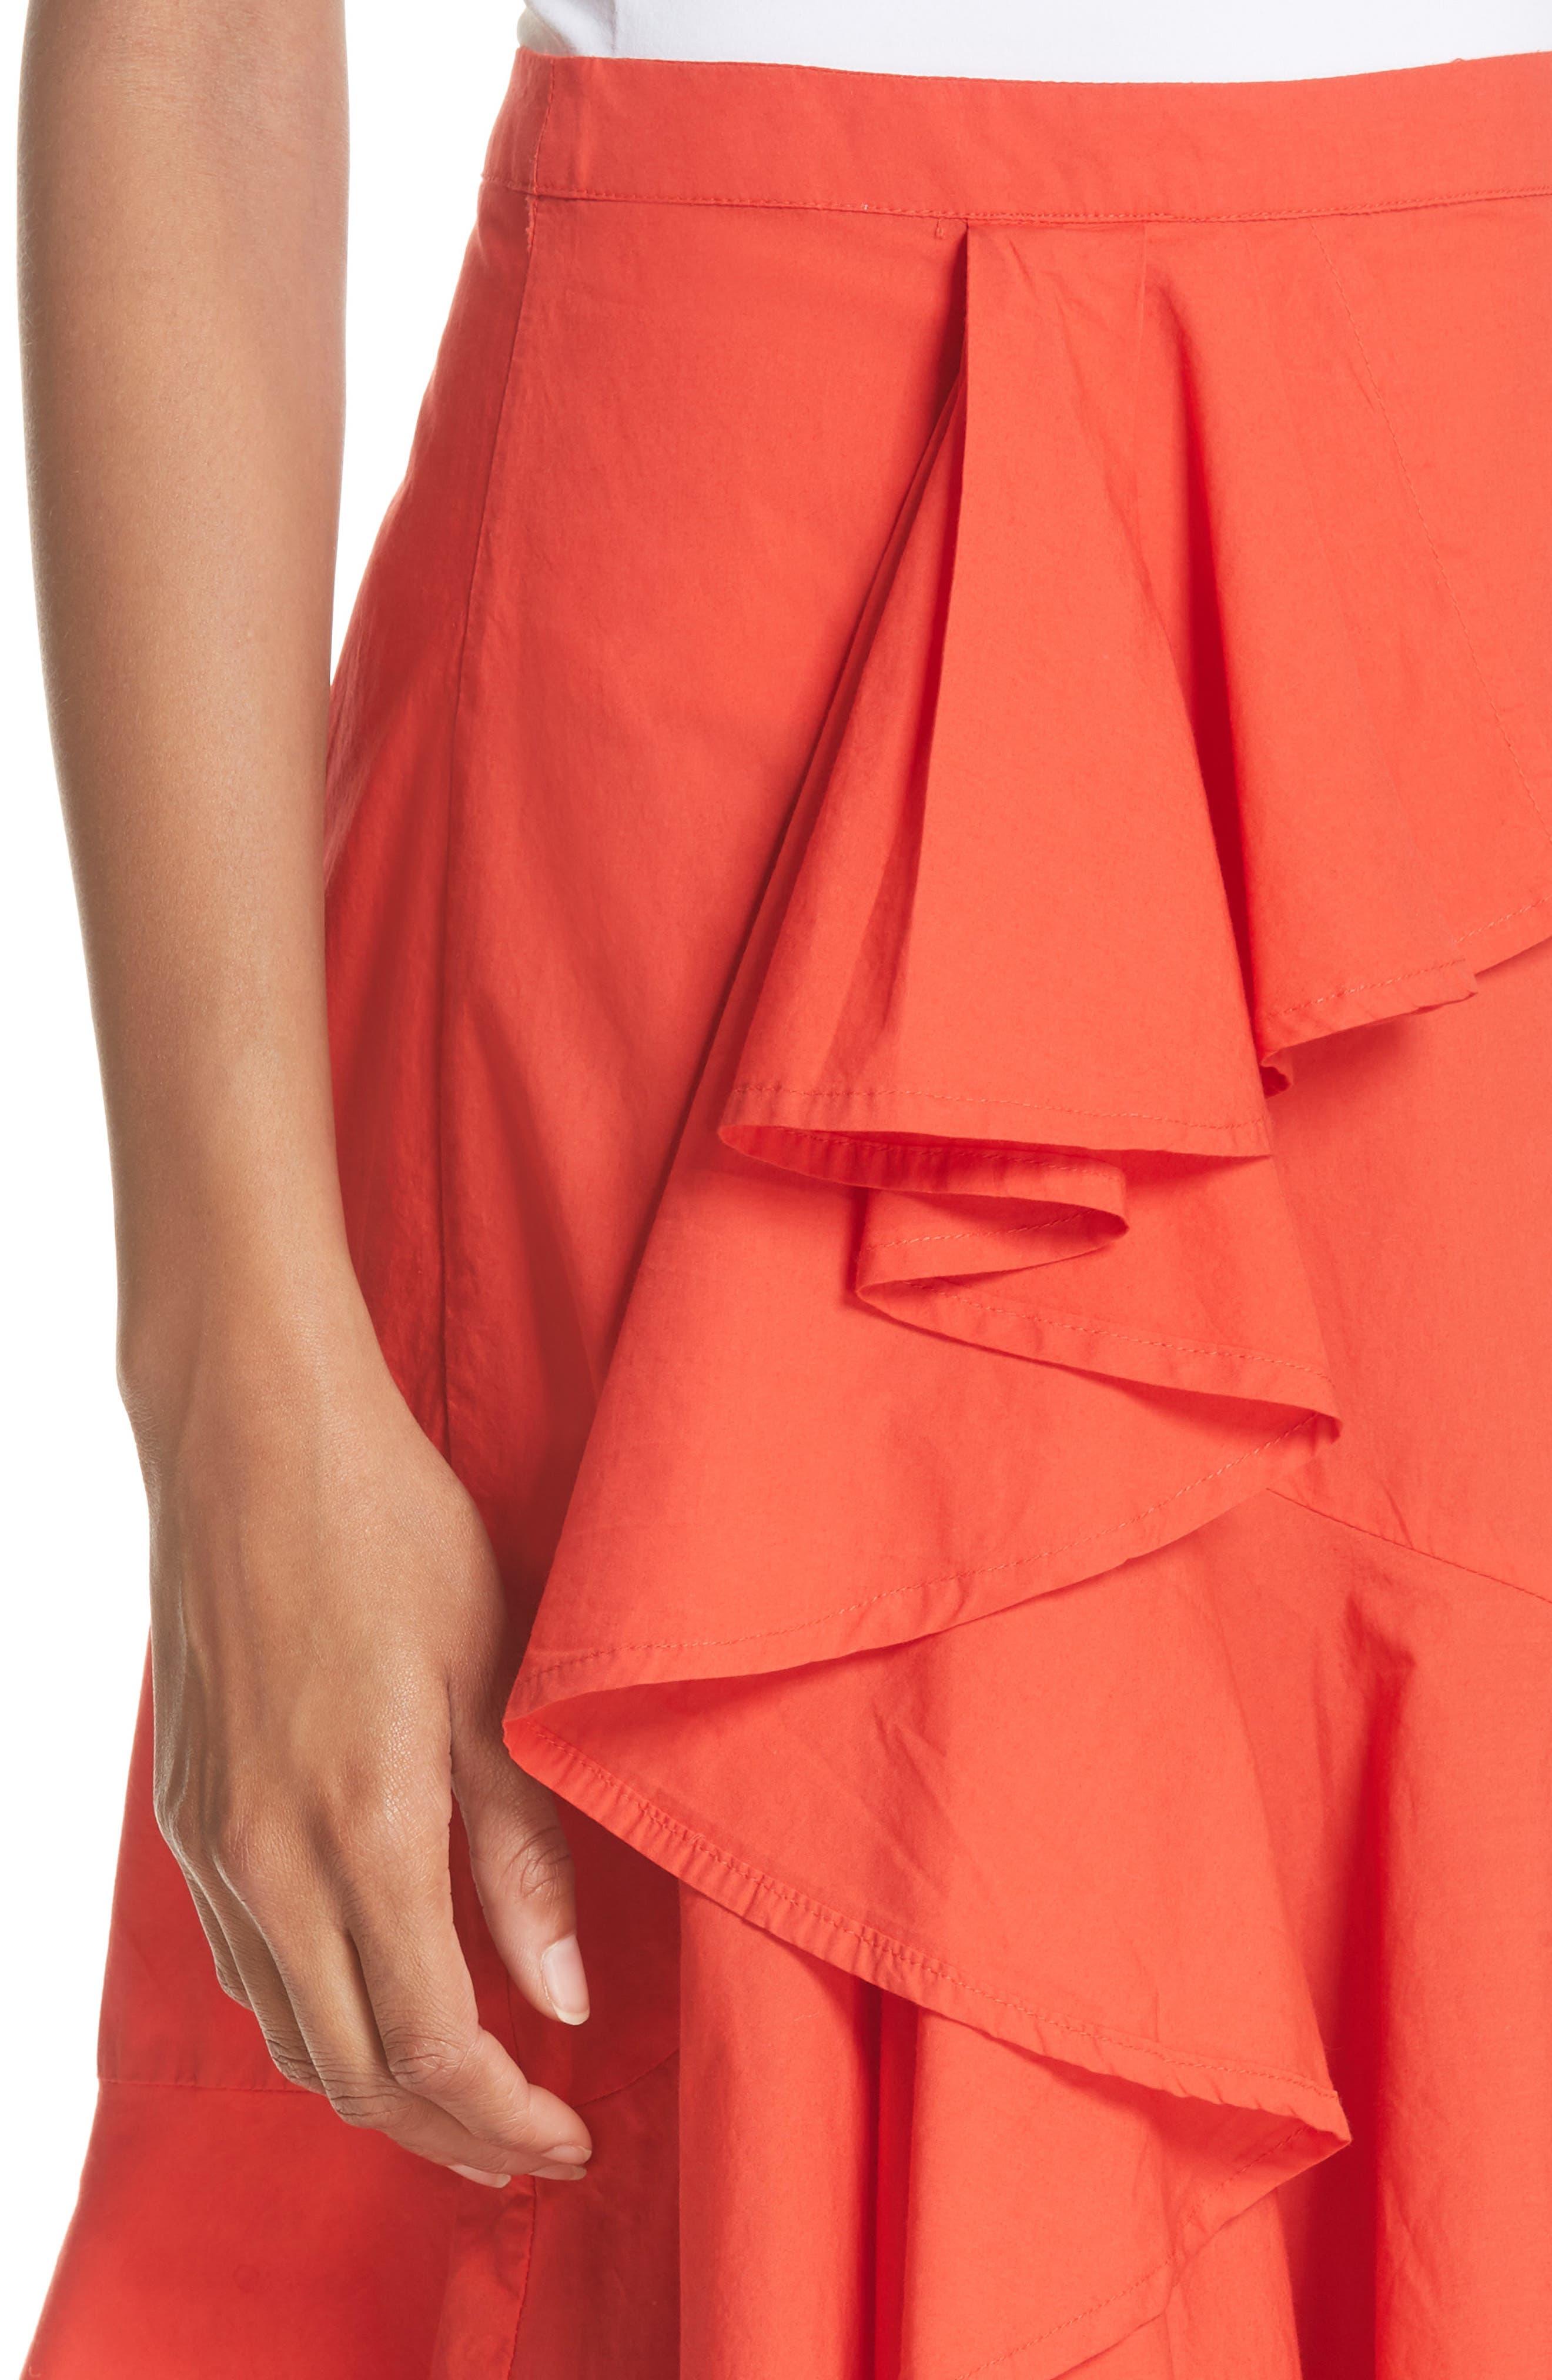 Chesmu Ruffled Cotton Skirt,                             Alternate thumbnail 8, color,